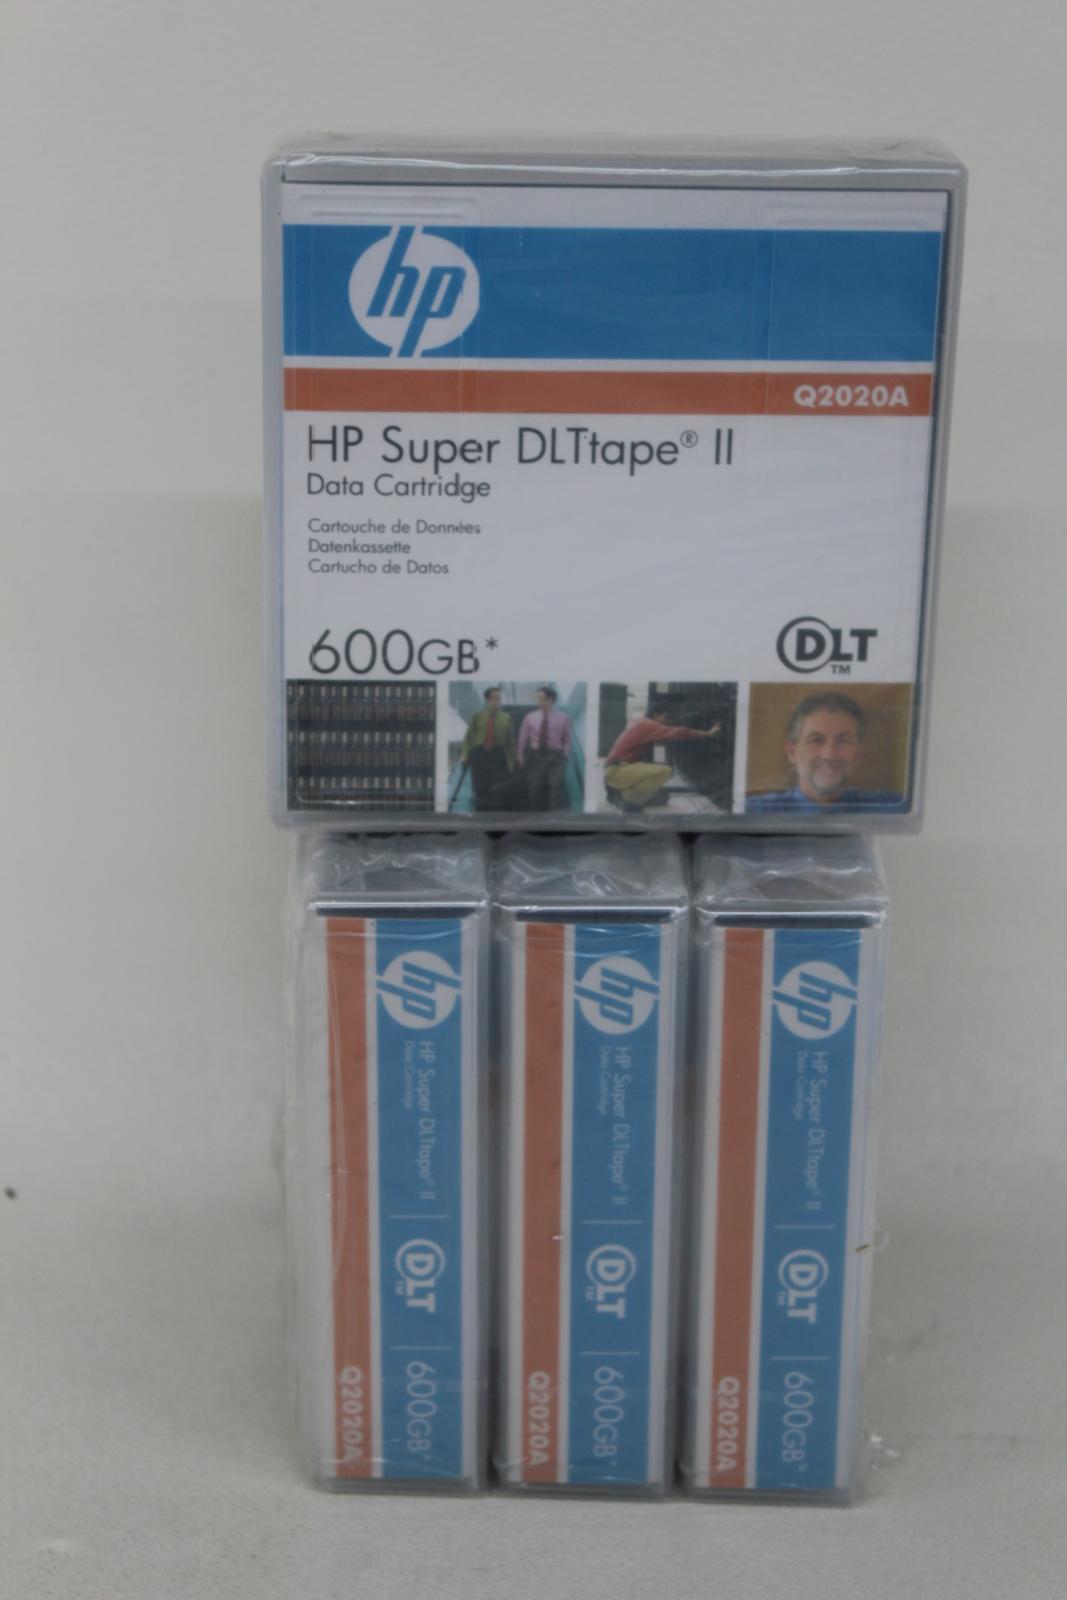 HP-Q2020A-Super-DLtape-II-Data-Tape-Square-cartouche-600-Go-job-lot-4x-NEUF miniature 12